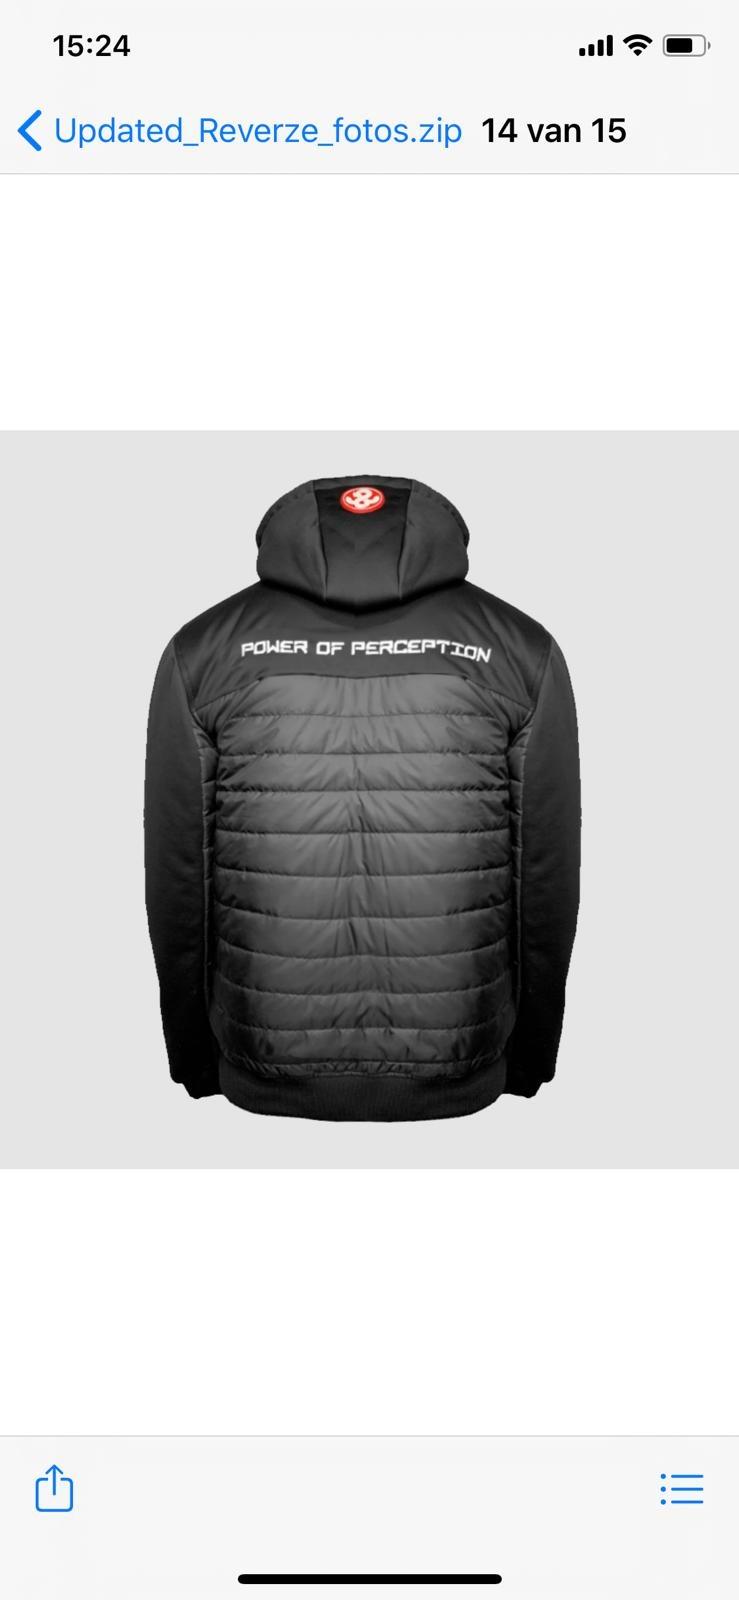 Power Of Perception - Power Jacket